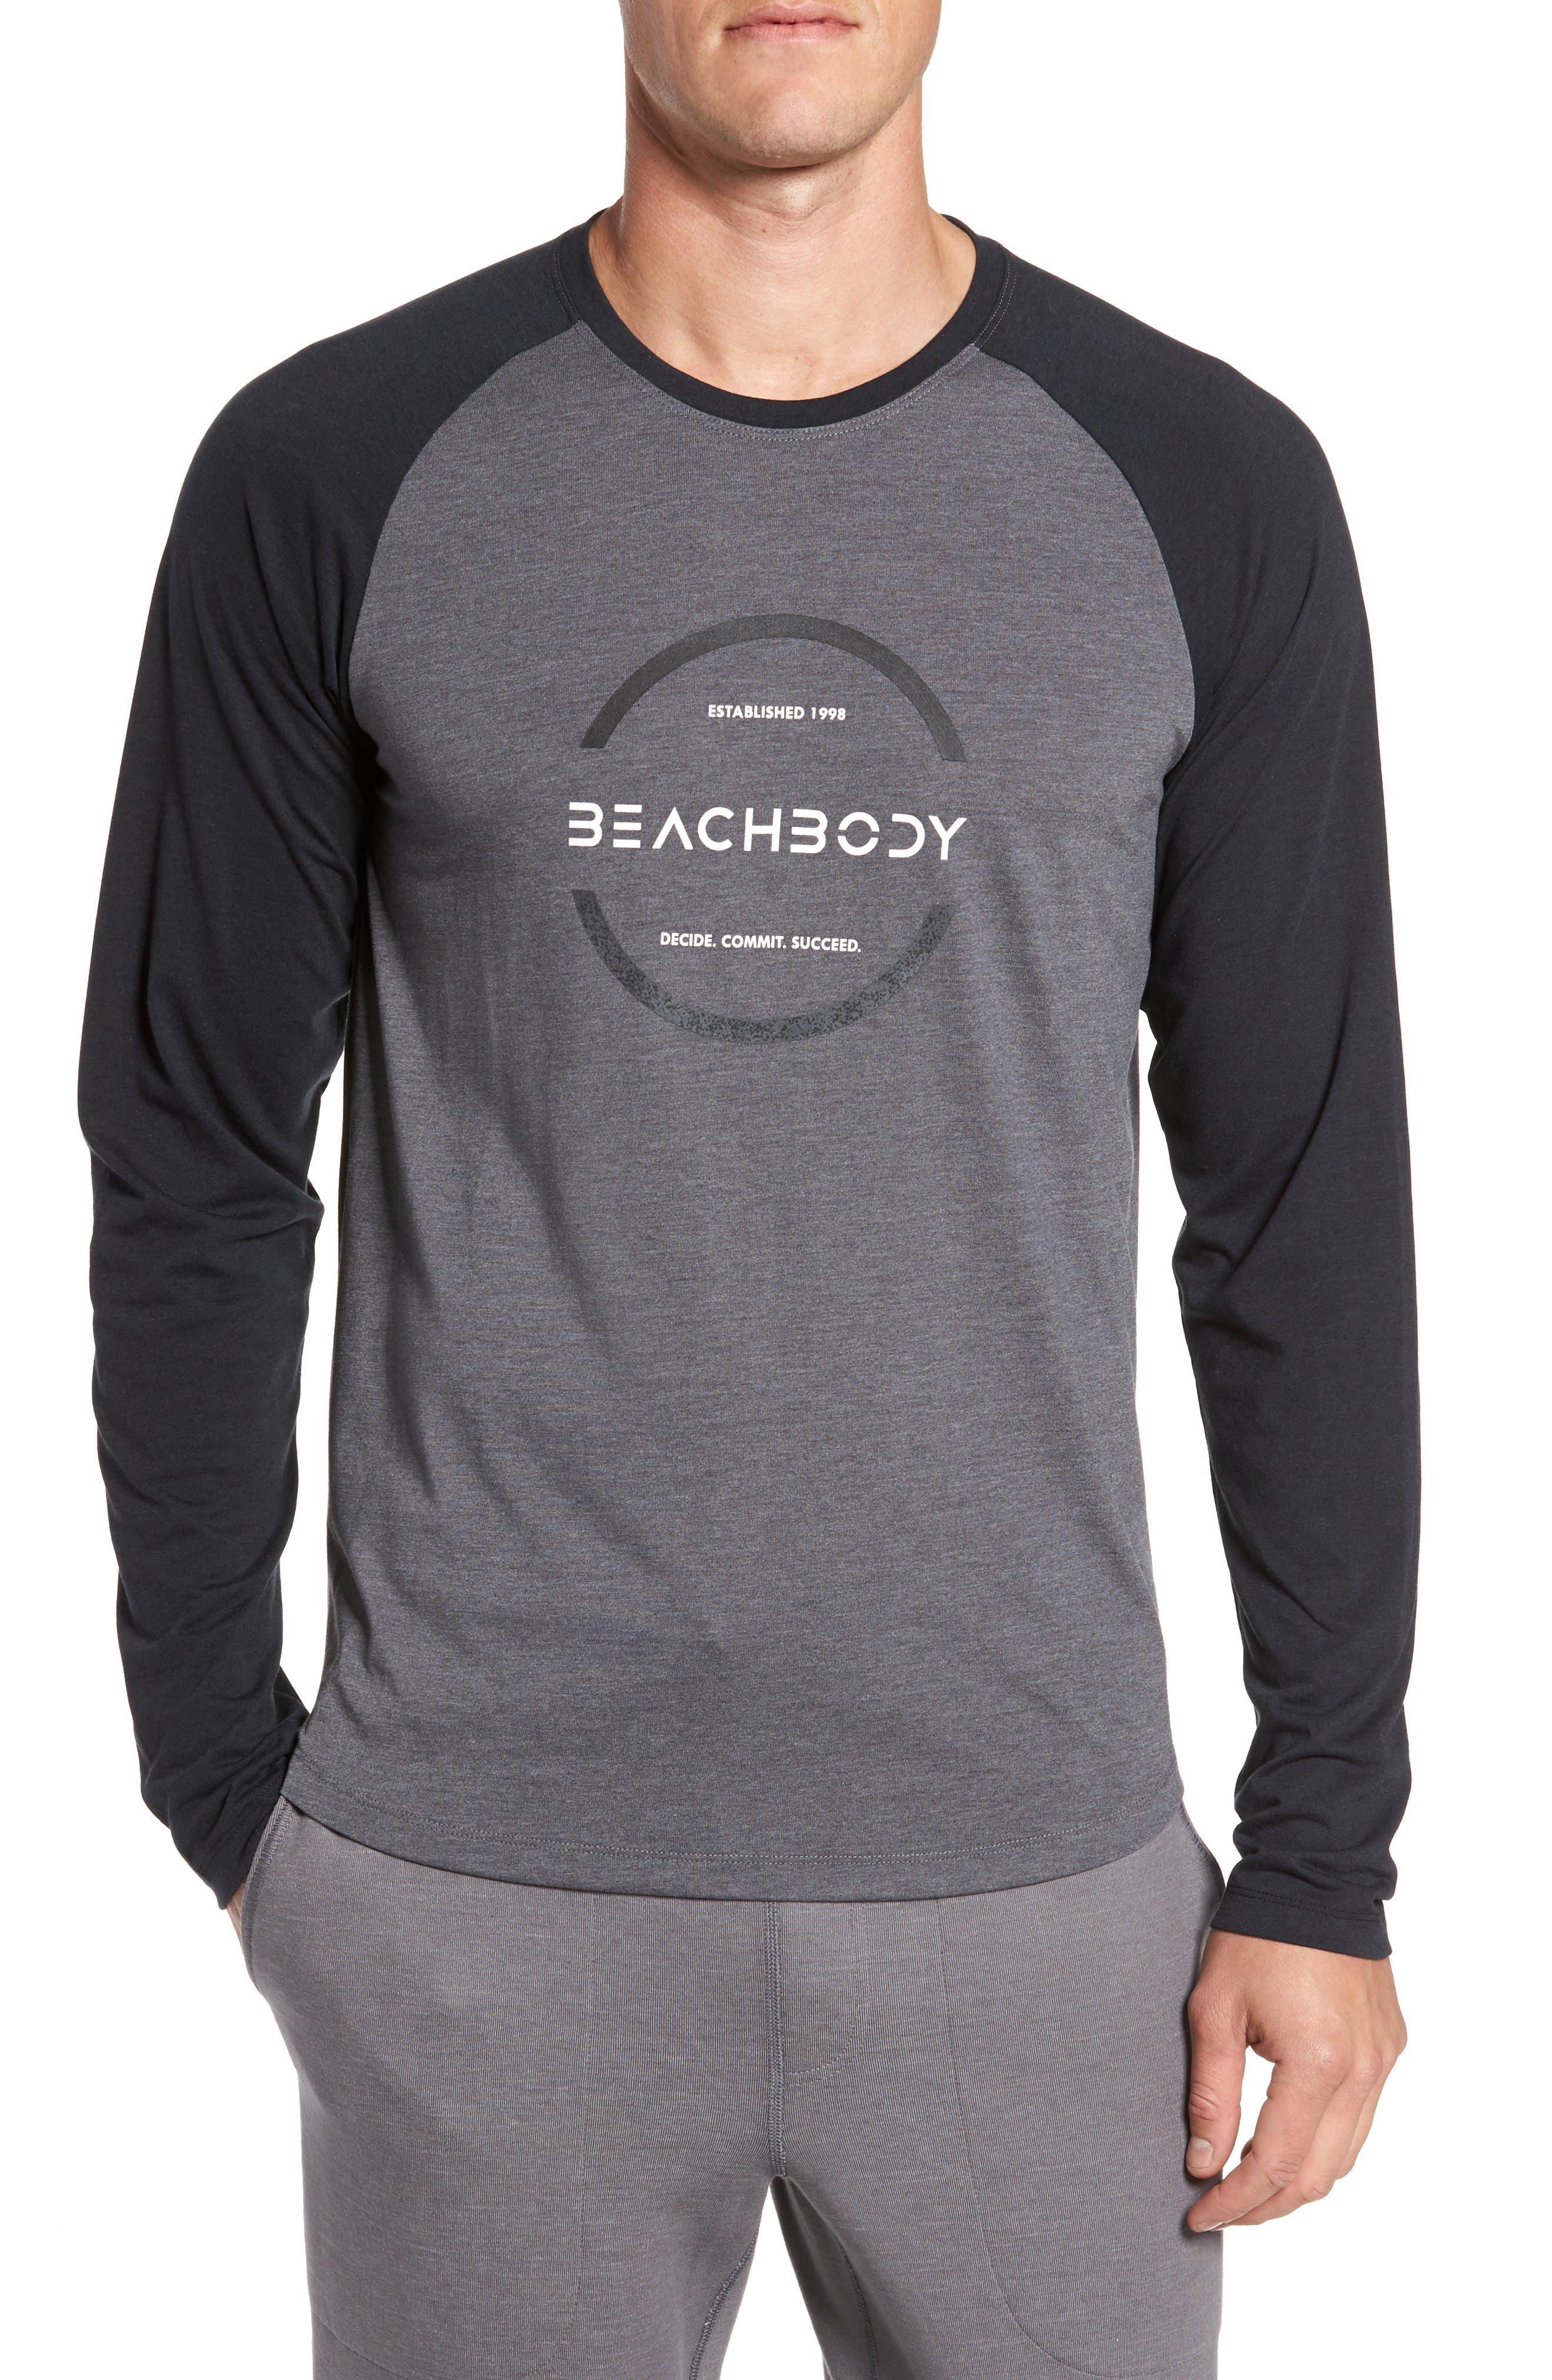 Main Image - Beachbody Go-To Infinity Long Sleeve T-Shirt